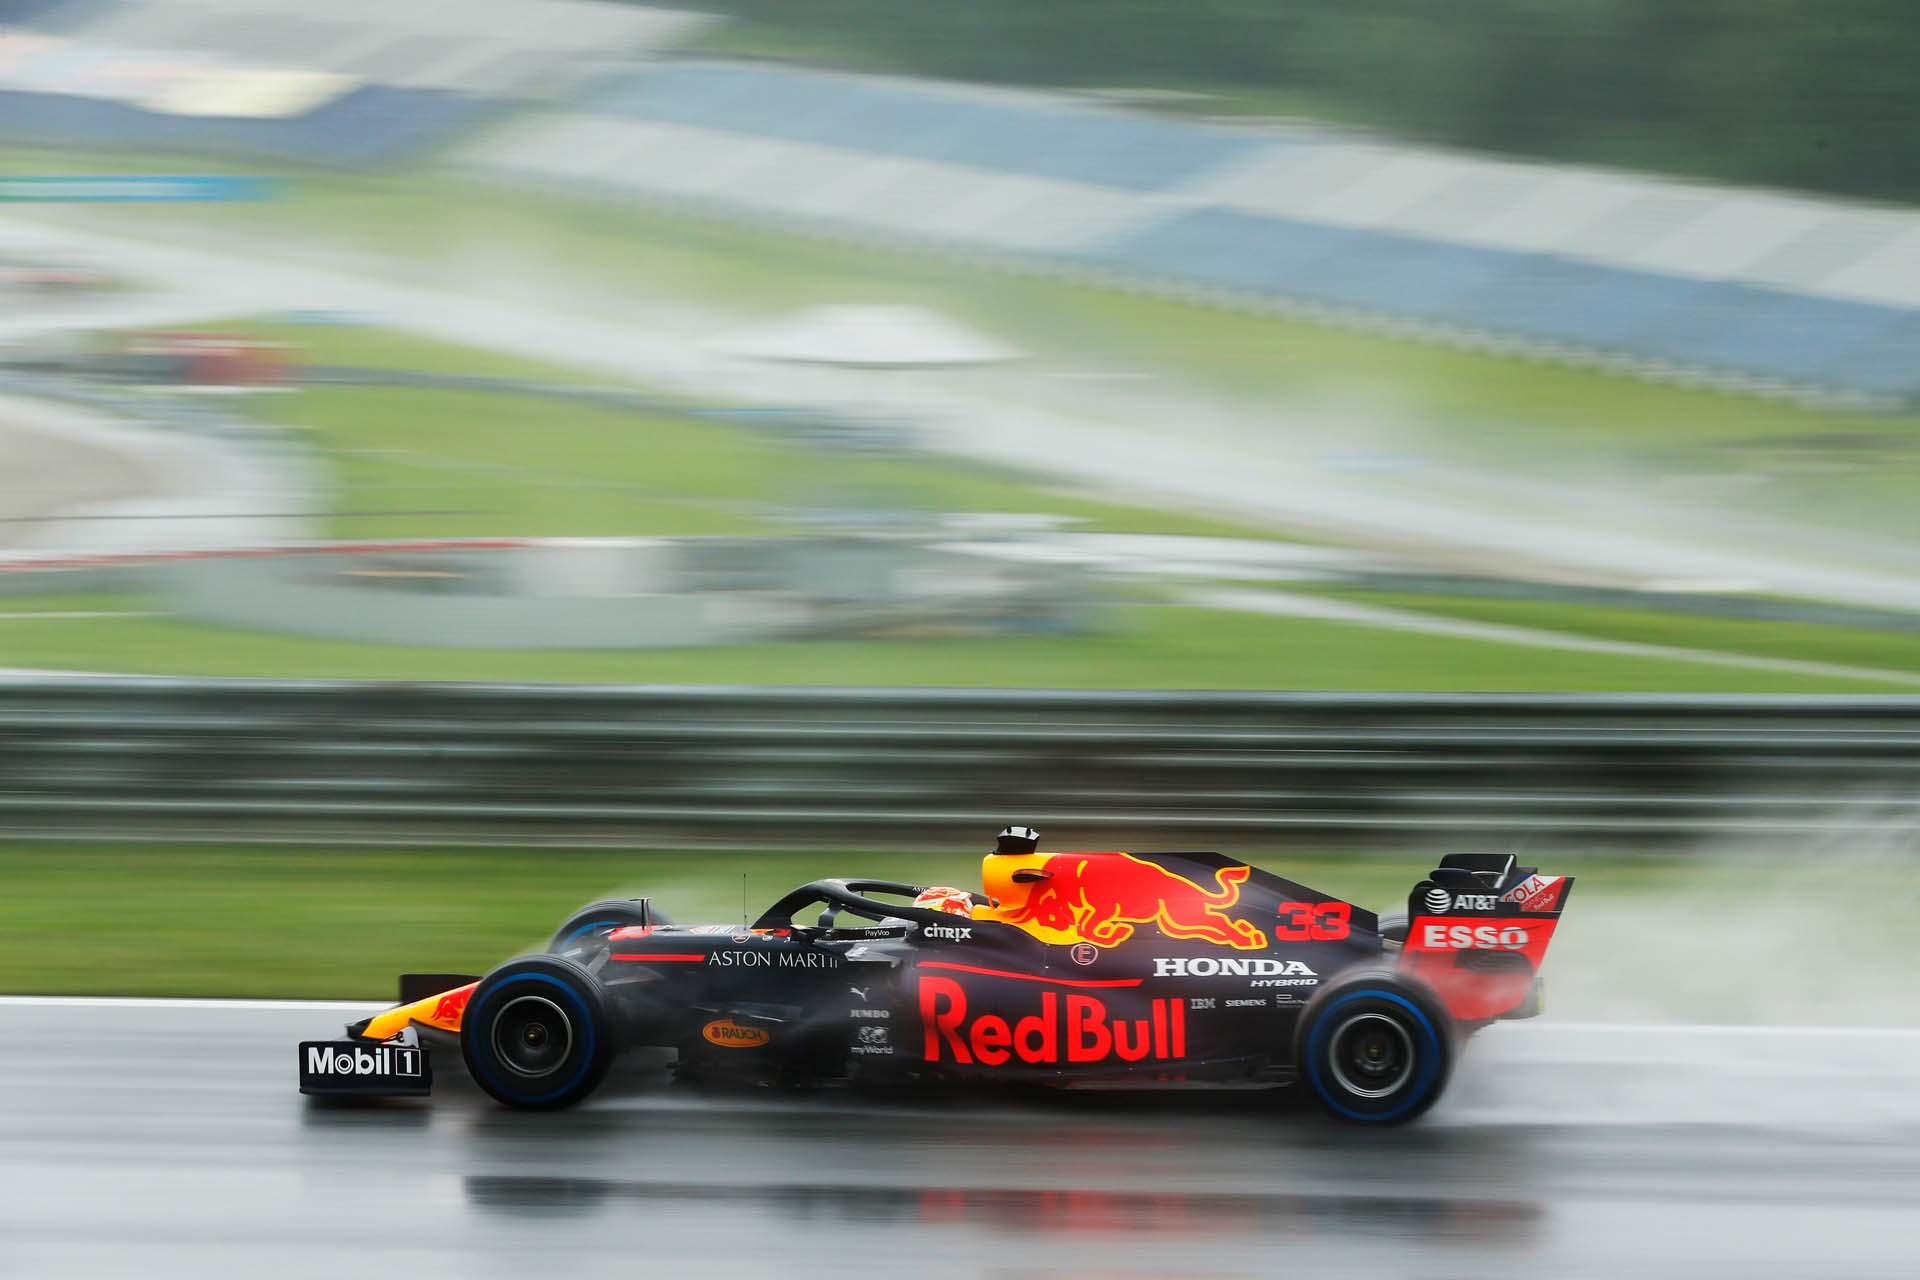 F1 Grand Prix of Styria - Qualifying